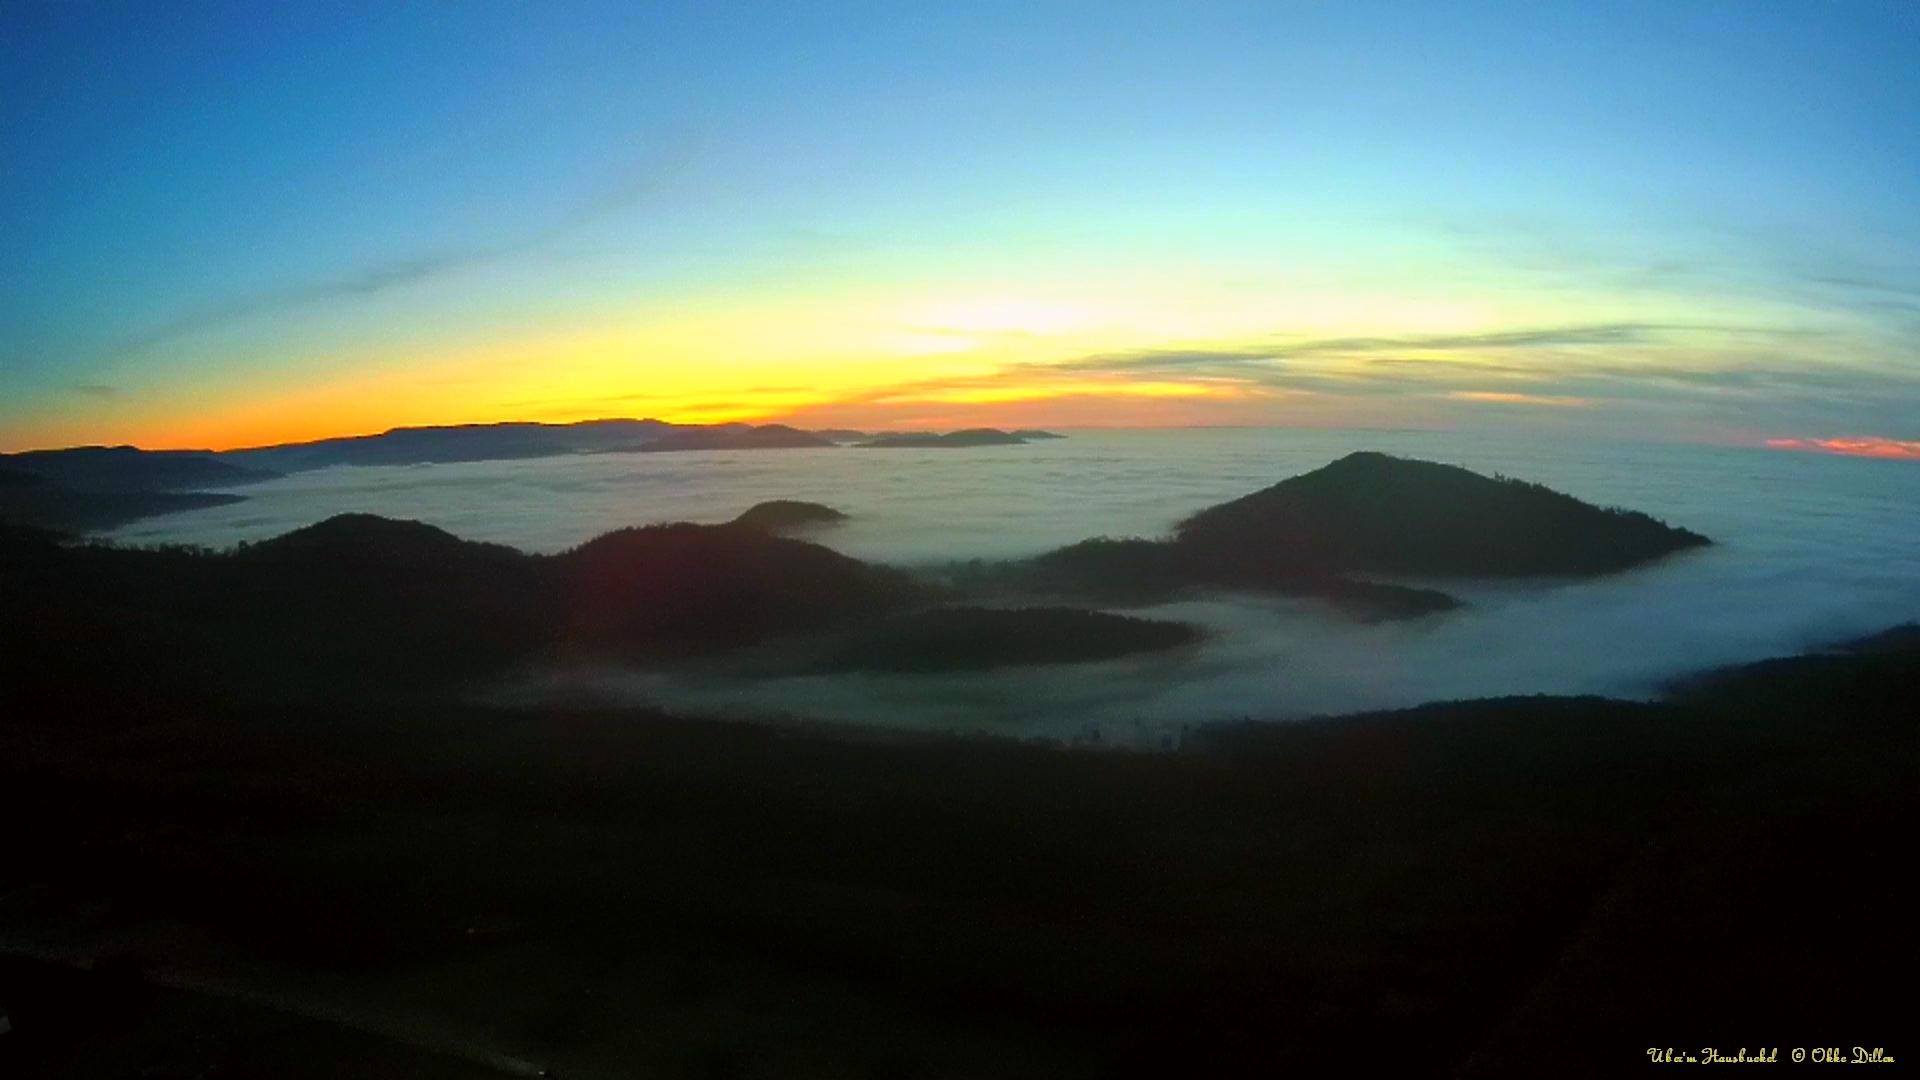 20151210 - Über dem Nebel 3_fhd.jpg